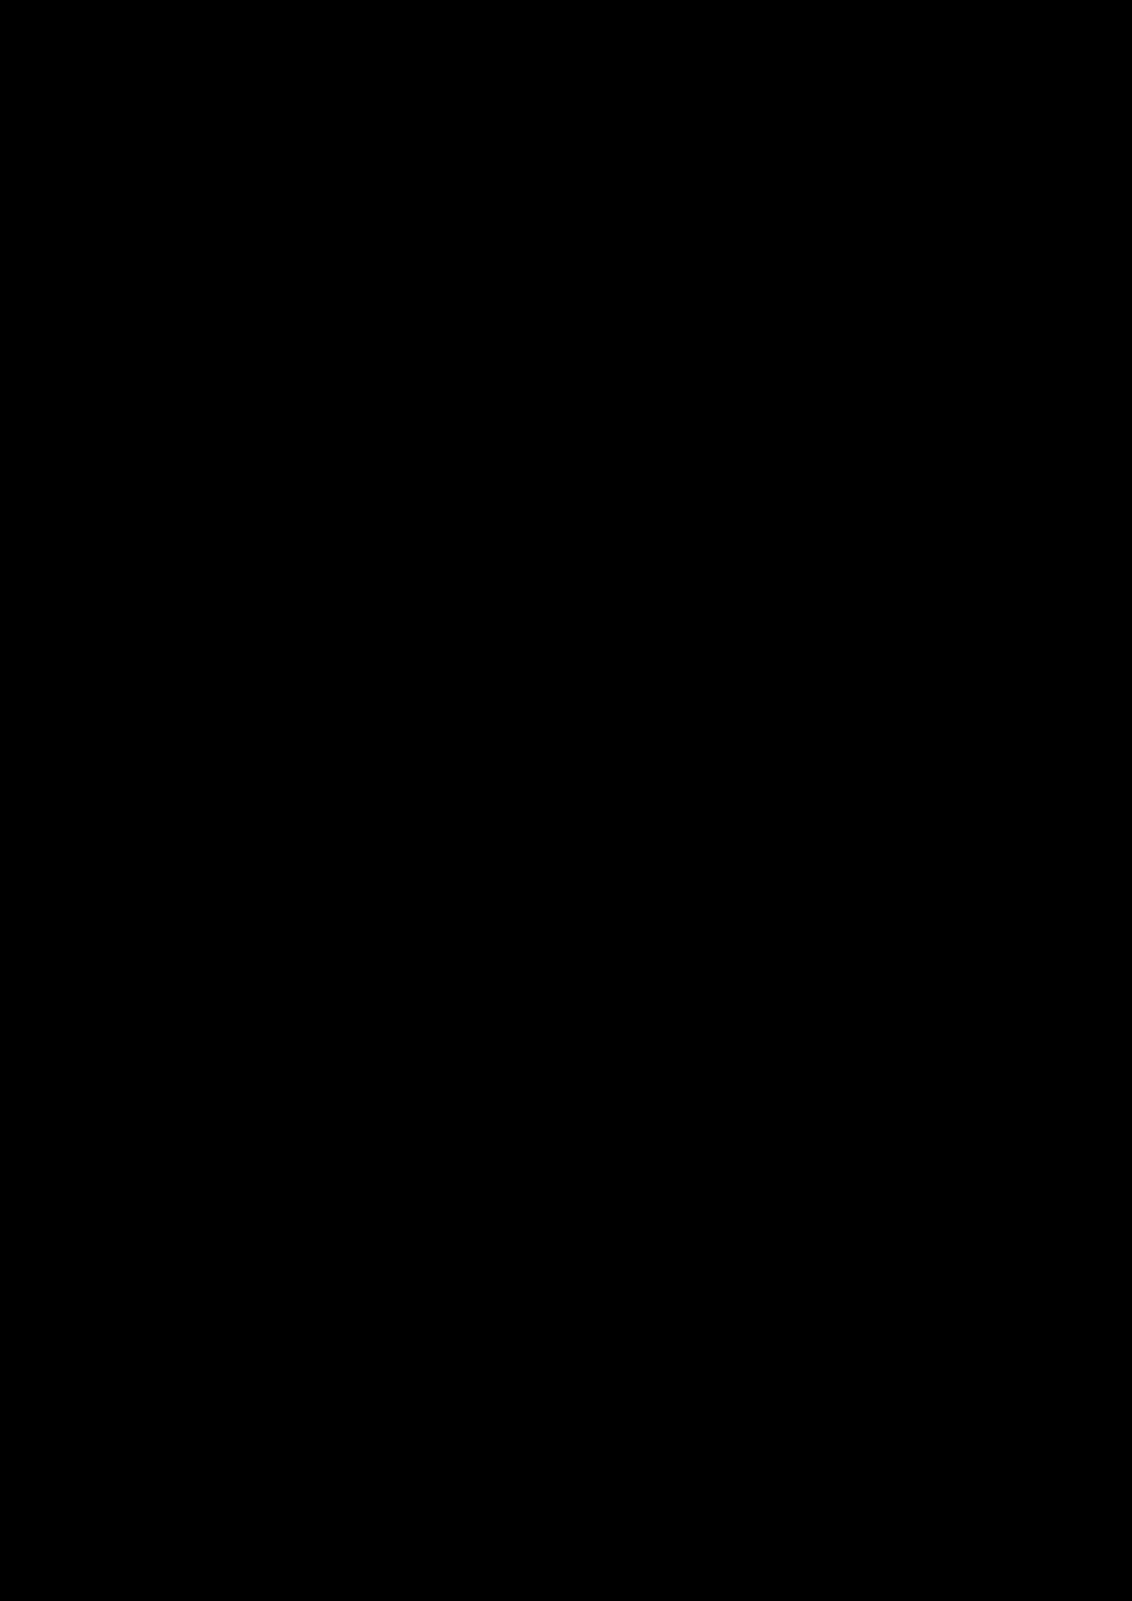 Belyiy sokol slide, Image 42